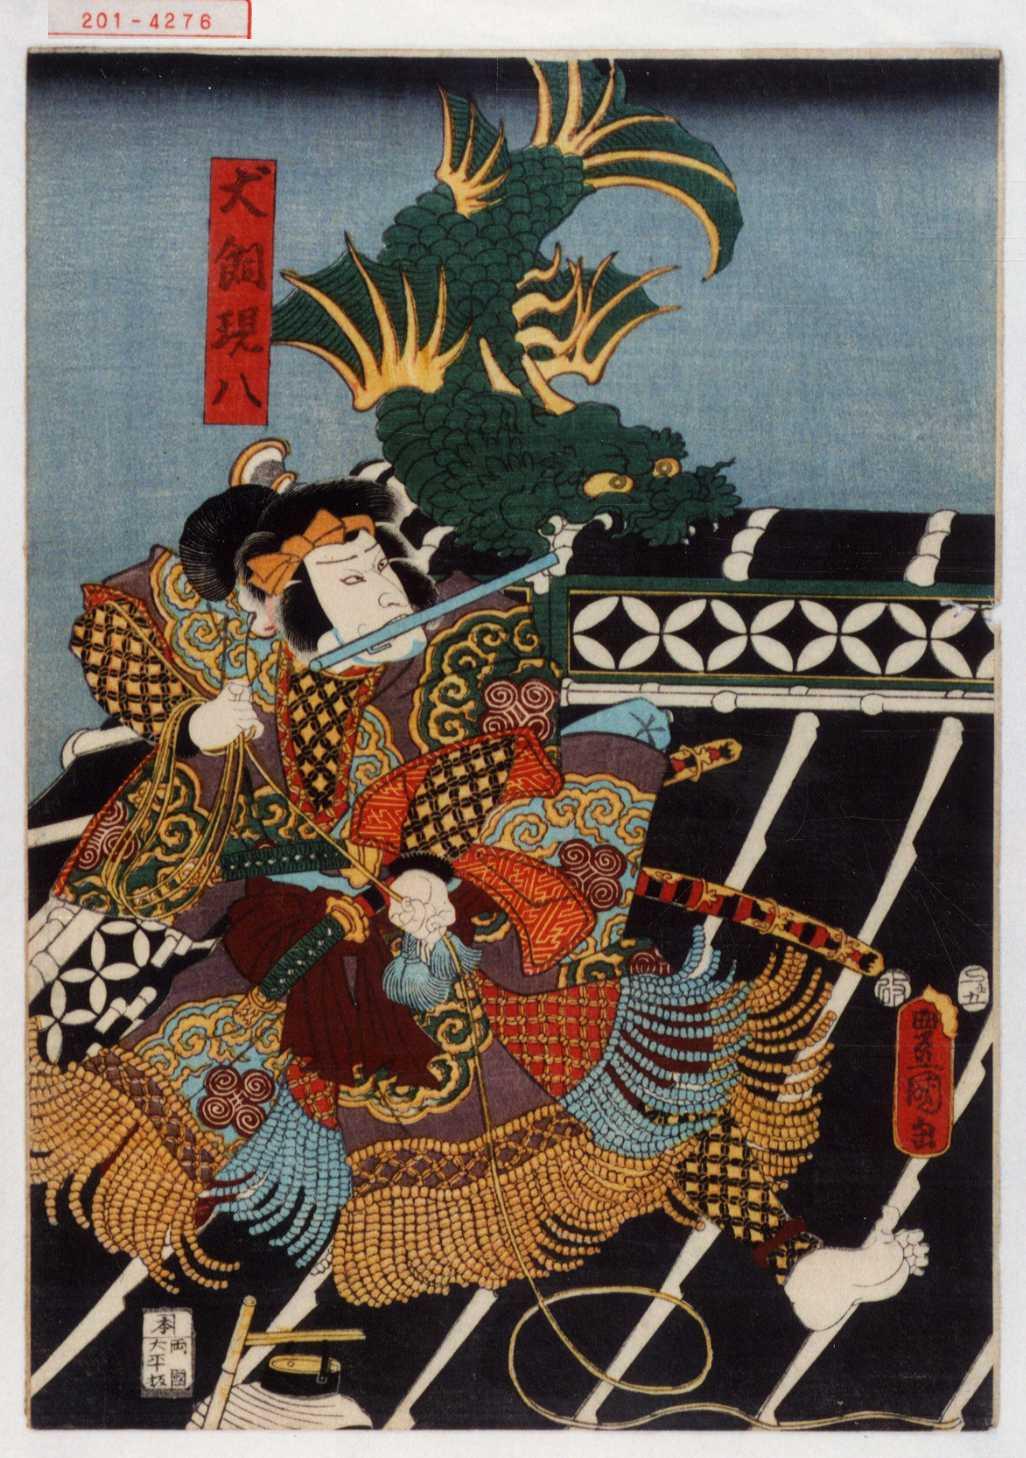 歌川国貞の画像 p1_20